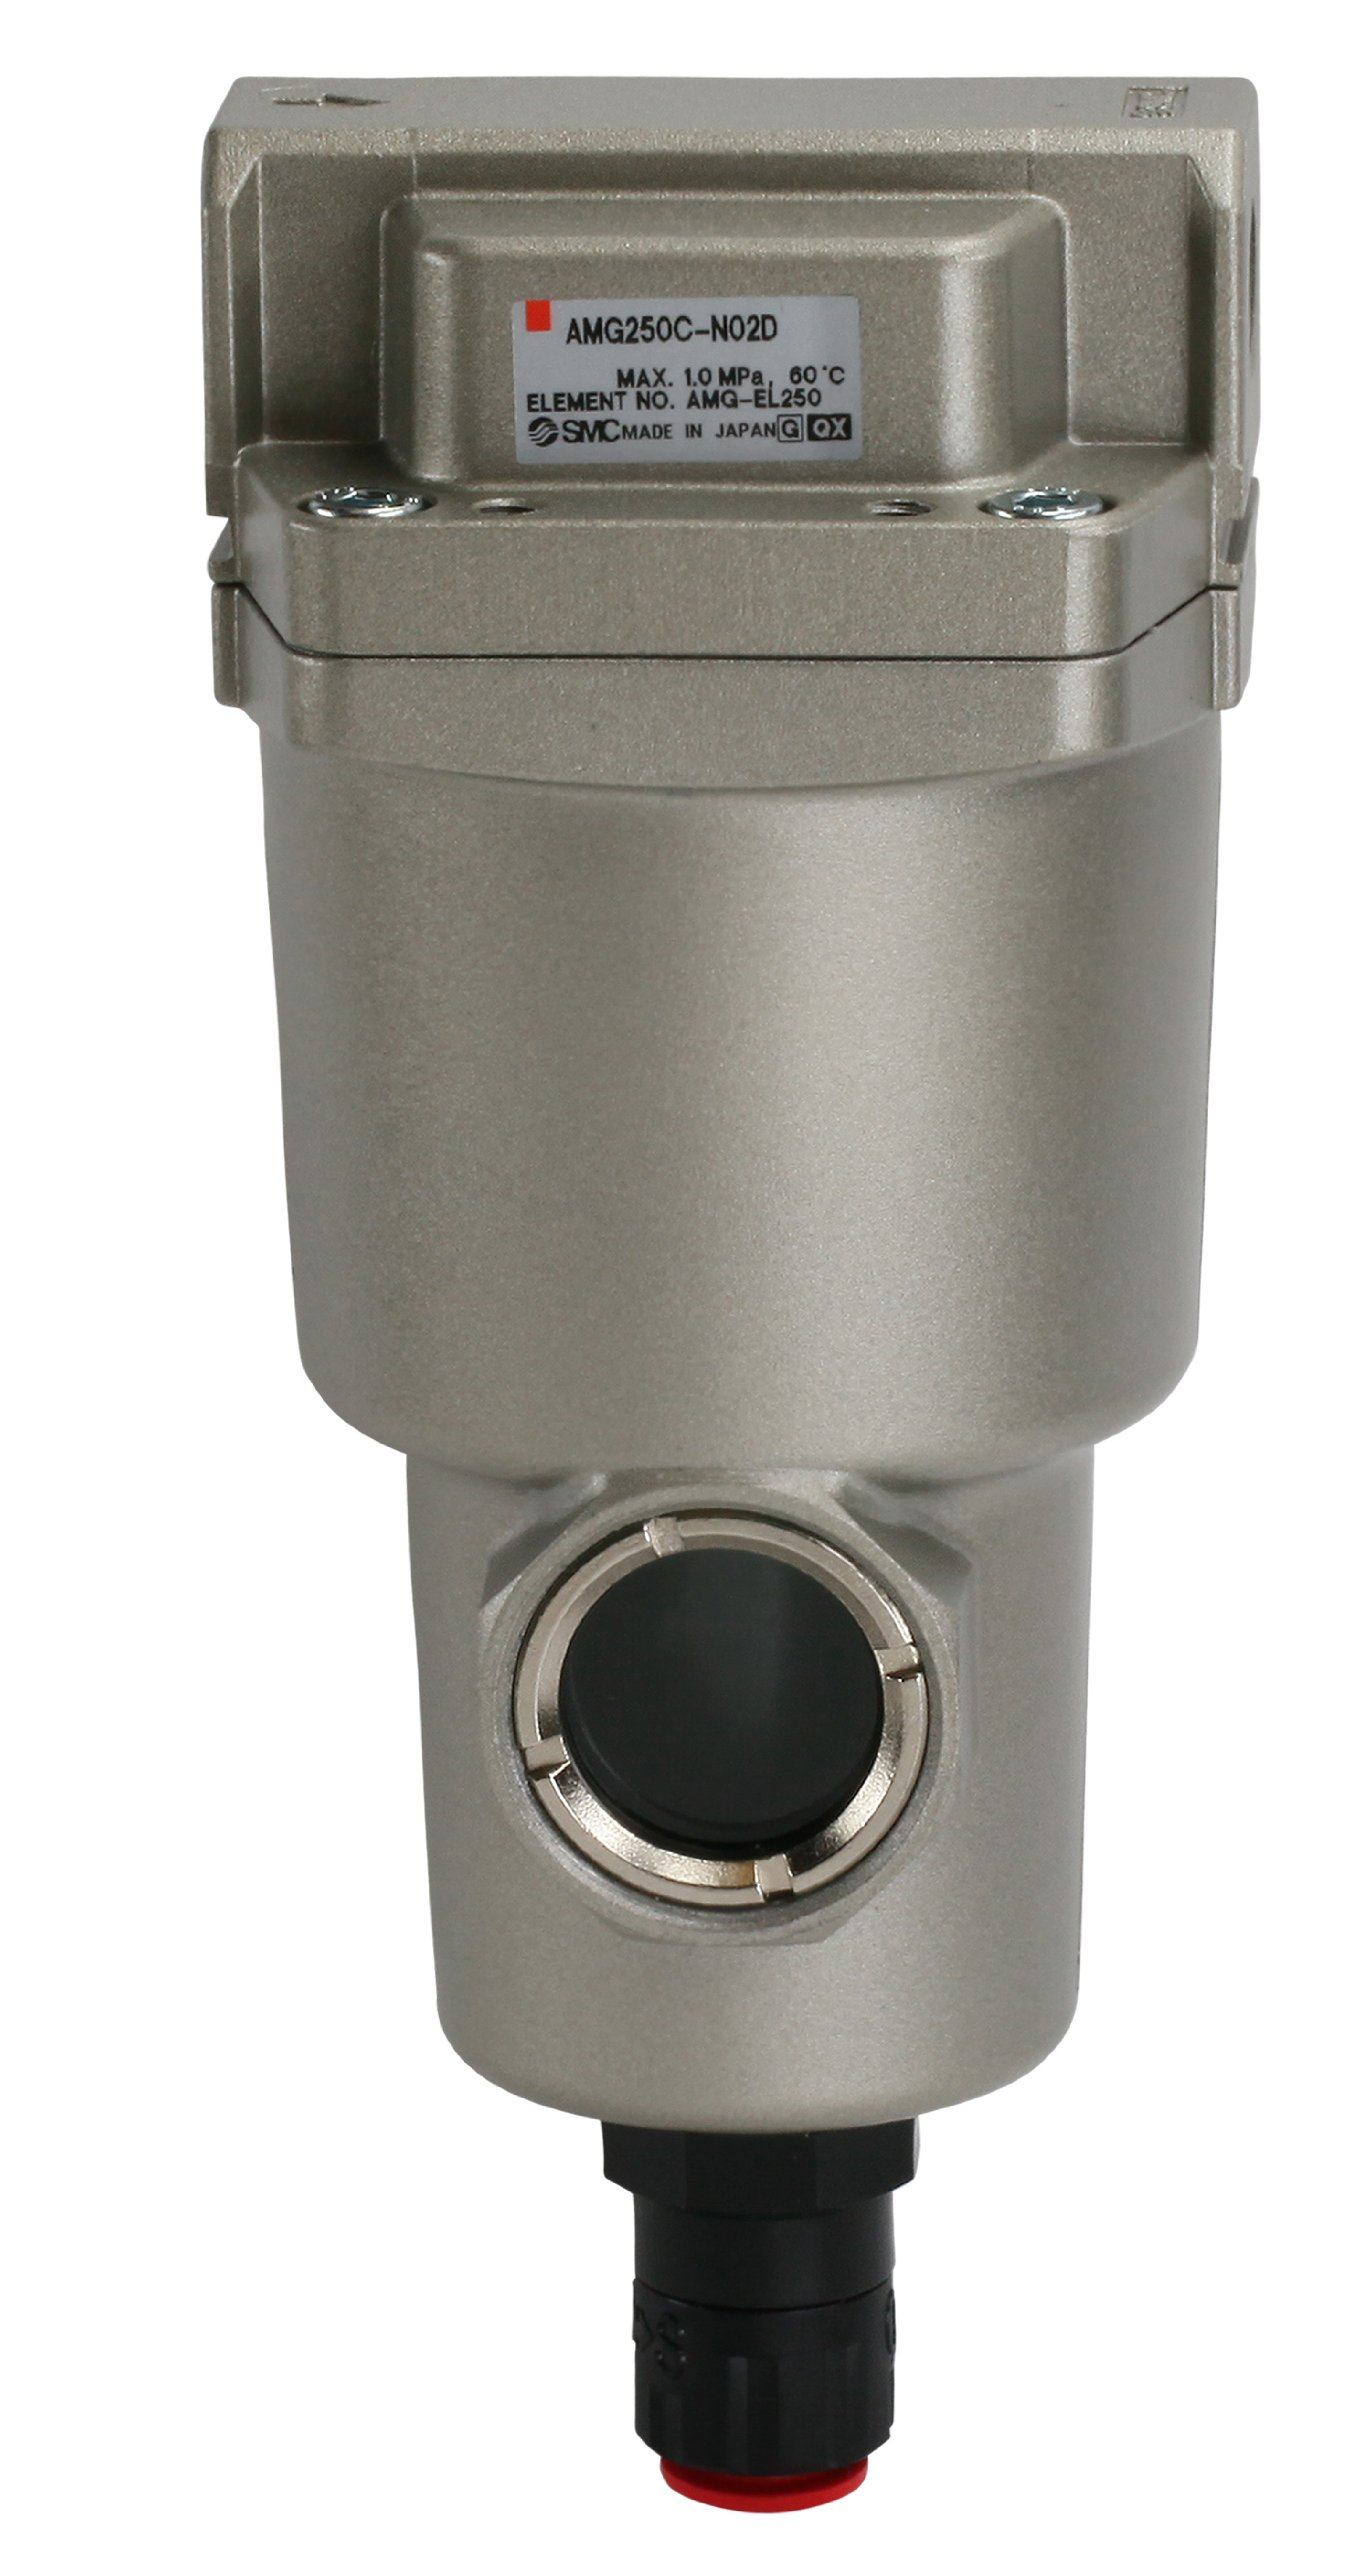 SMC AMG250C-N03D Water Separator, N.O. Auto Drain, 750 L/min, 3/8'' NPT